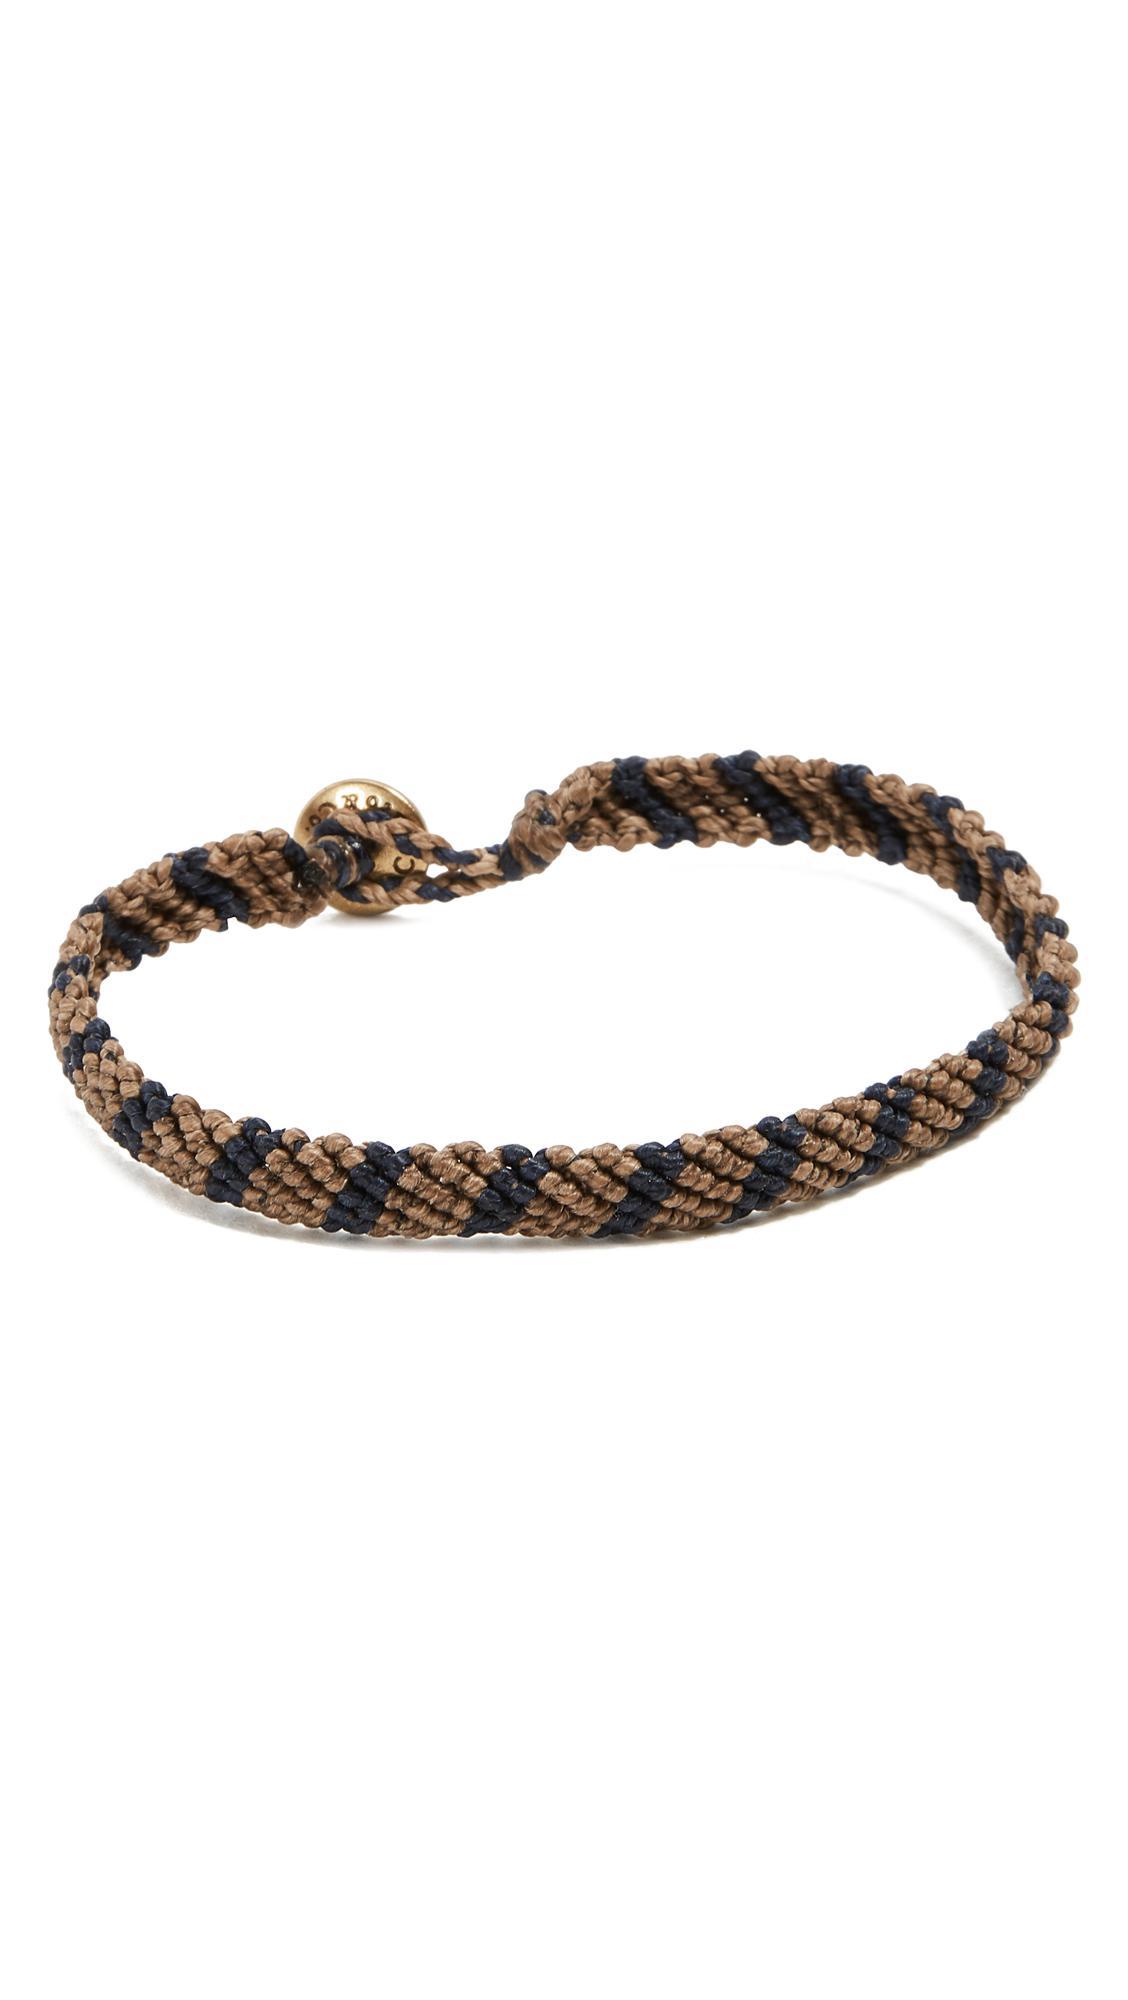 Caputo & Co. Hand-Knotted Stripe Bracelet - Brown/Navy Ou5sLB